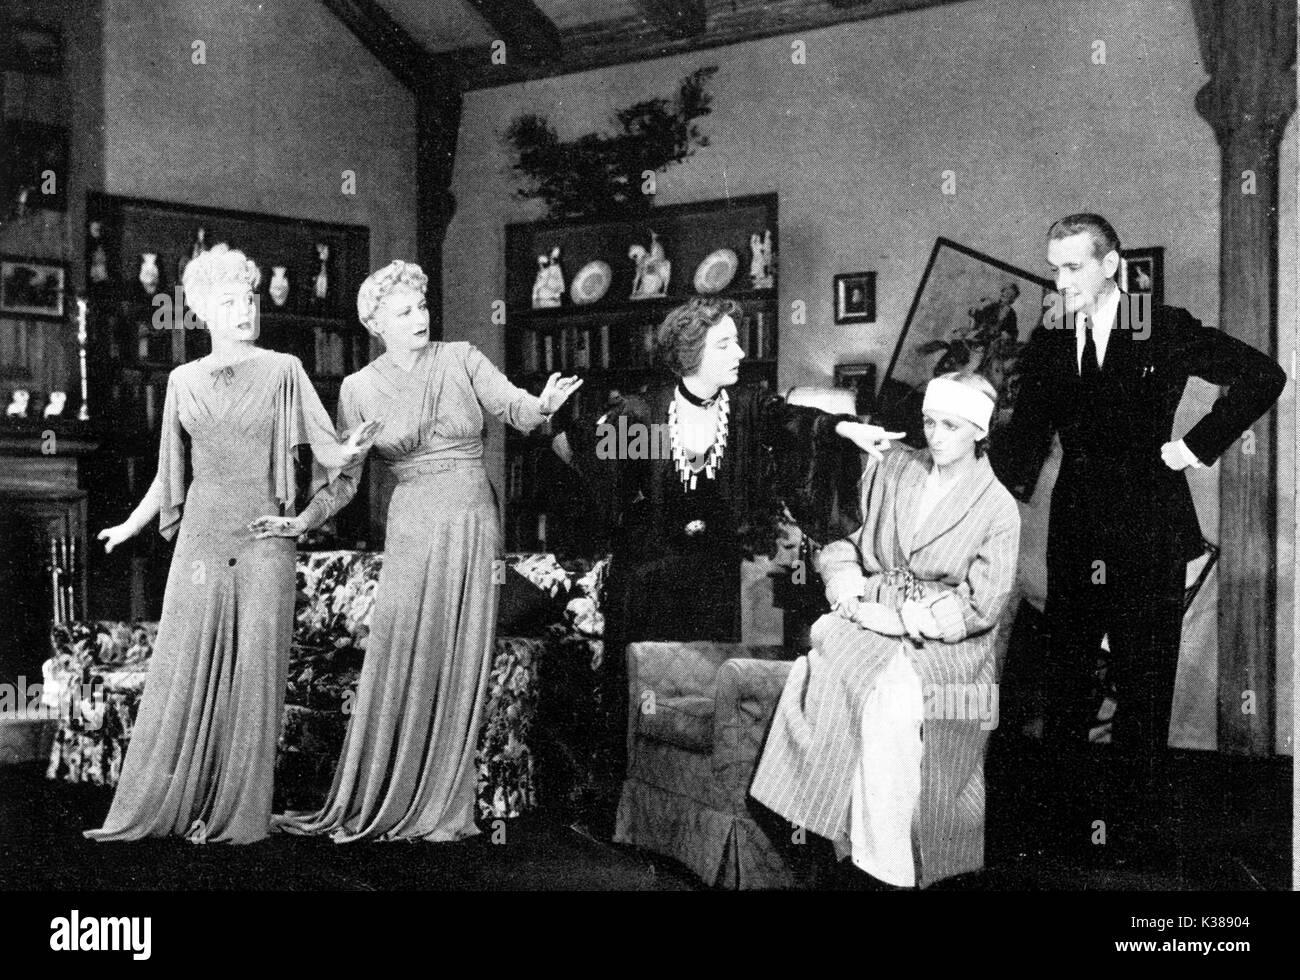 Anita Page Adult videos James Villiers (1933?998),Philippa Gail